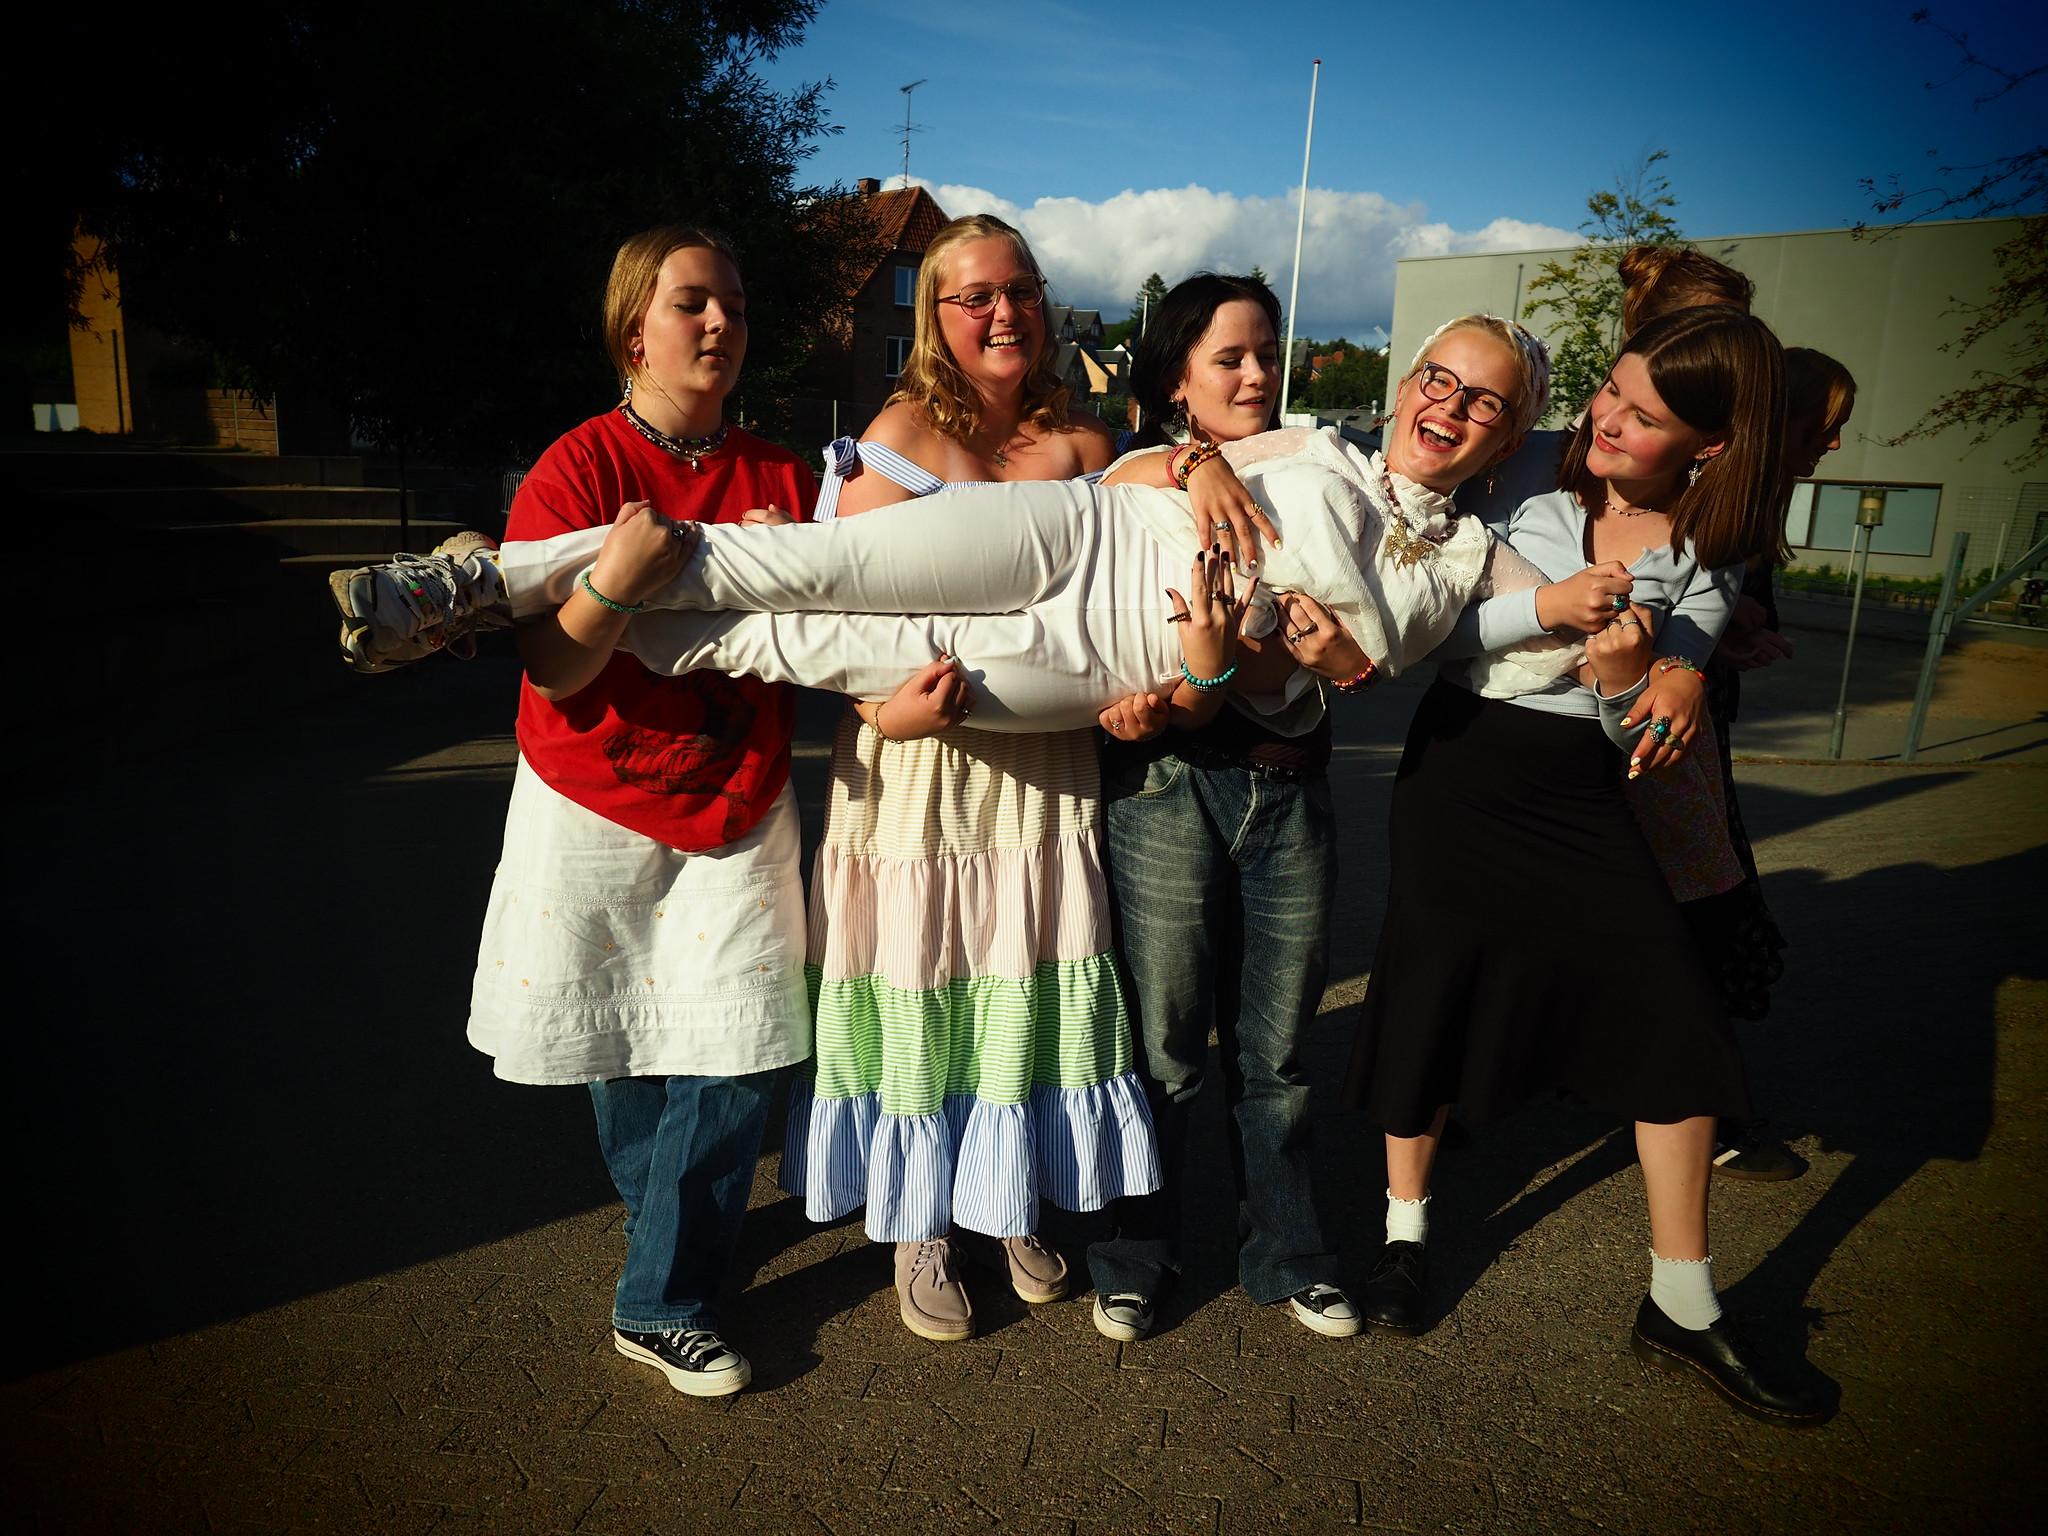 2021 - August - Røskvas konfirmation